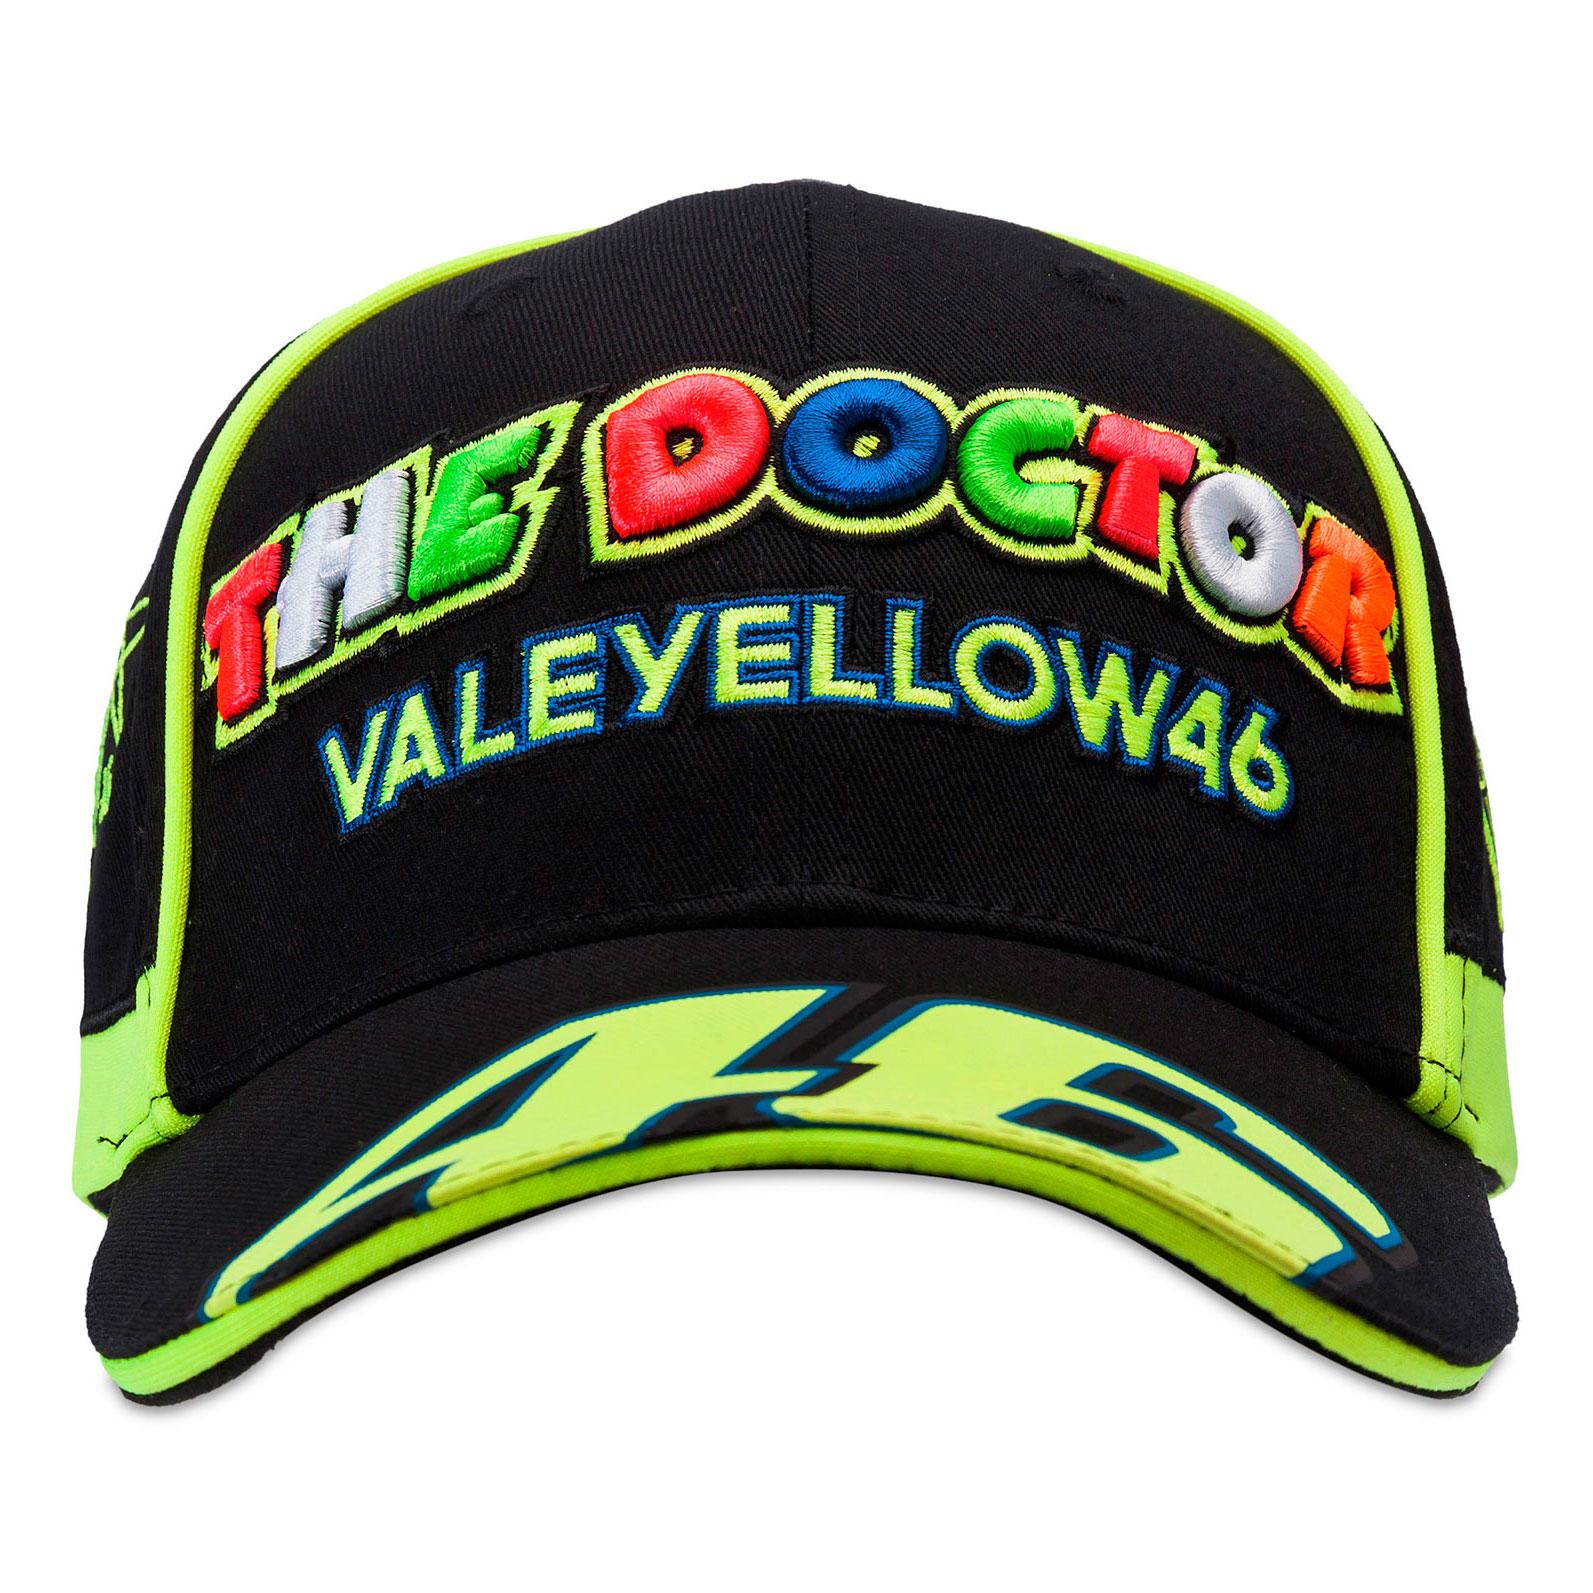 dffb92fe9a259 Gorra Valentino Rossi The Doctor 46 Negra 2017 en Motorbike Store